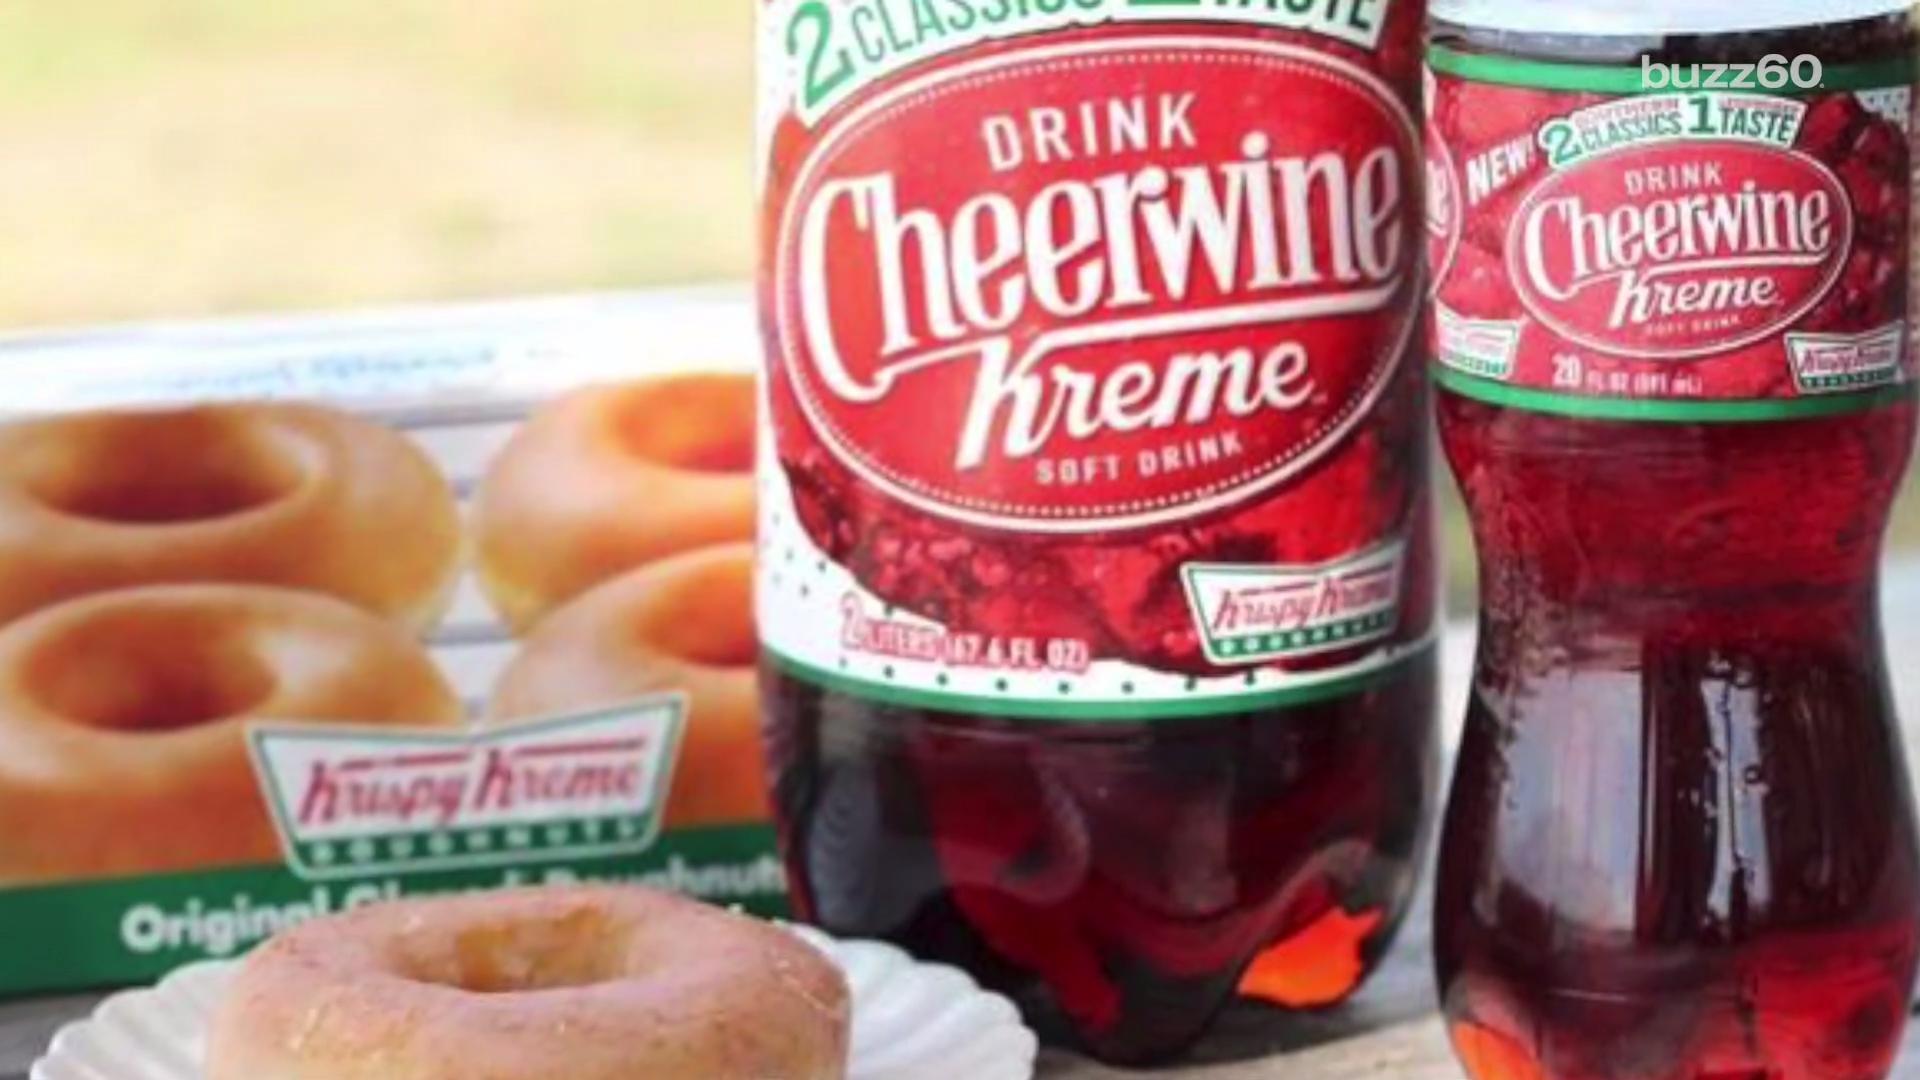 Krispy Kreme Making Donut Soda with Cheerwine